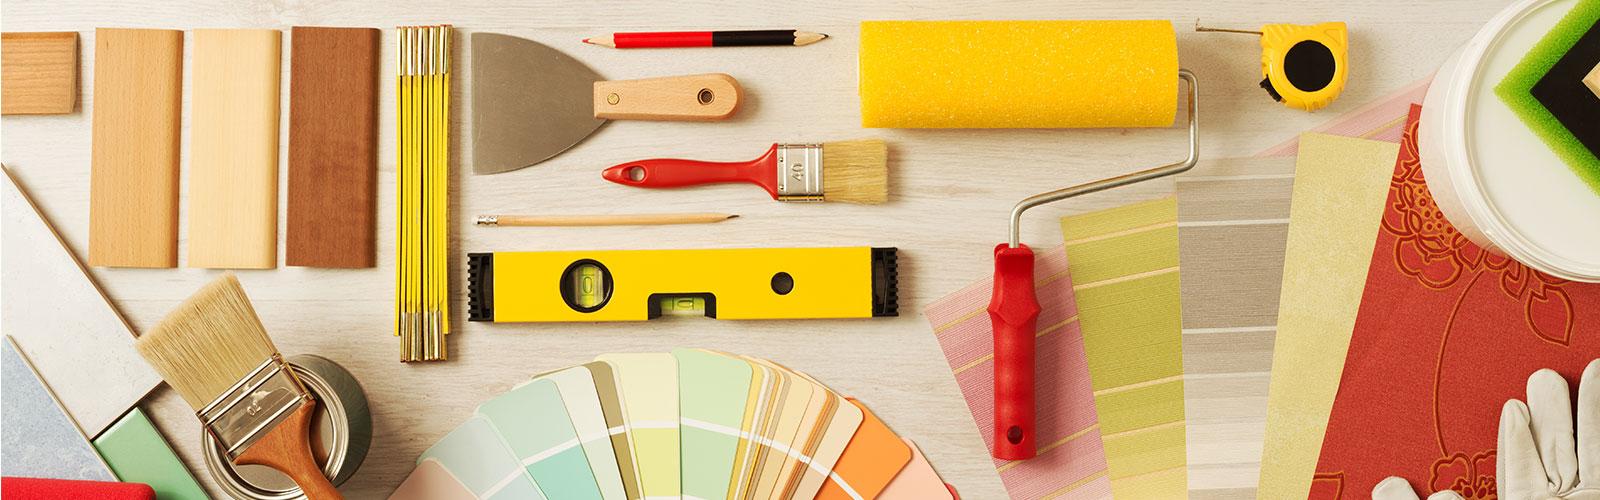 Painting 101 decorative paint training